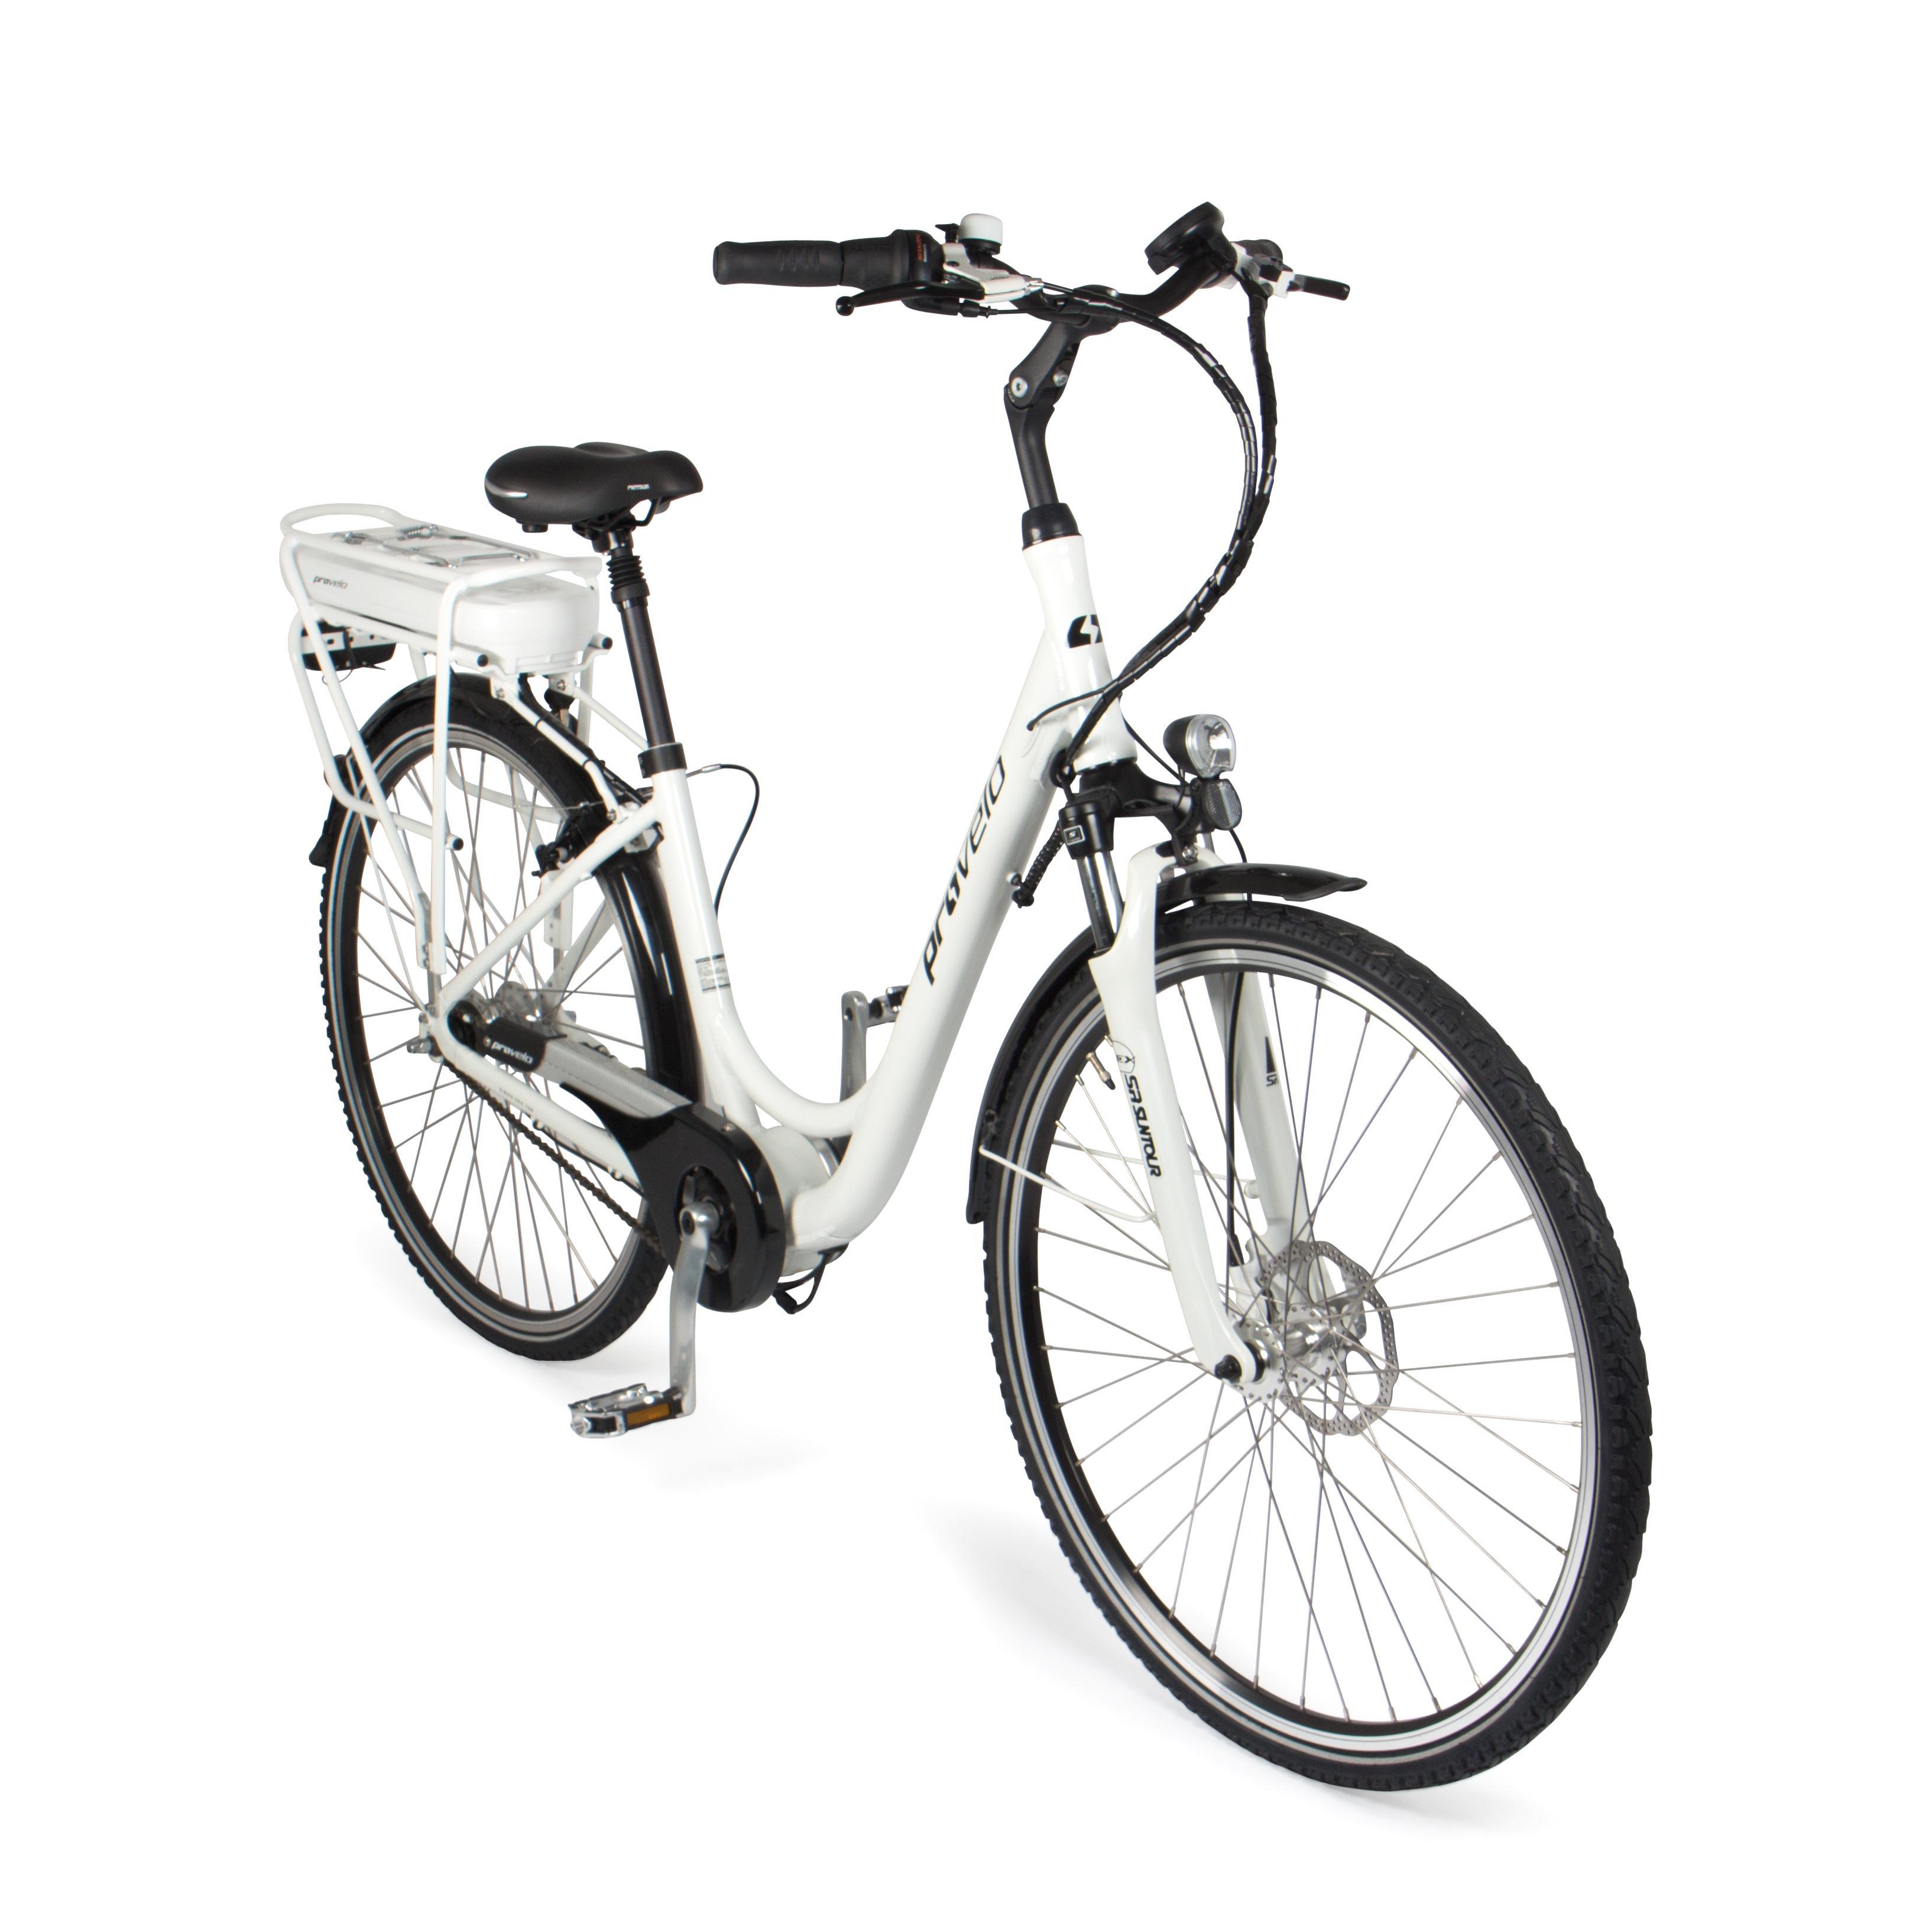 provelo e bike e fahrrad elektrofahrrad faltrad fahrrad. Black Bedroom Furniture Sets. Home Design Ideas